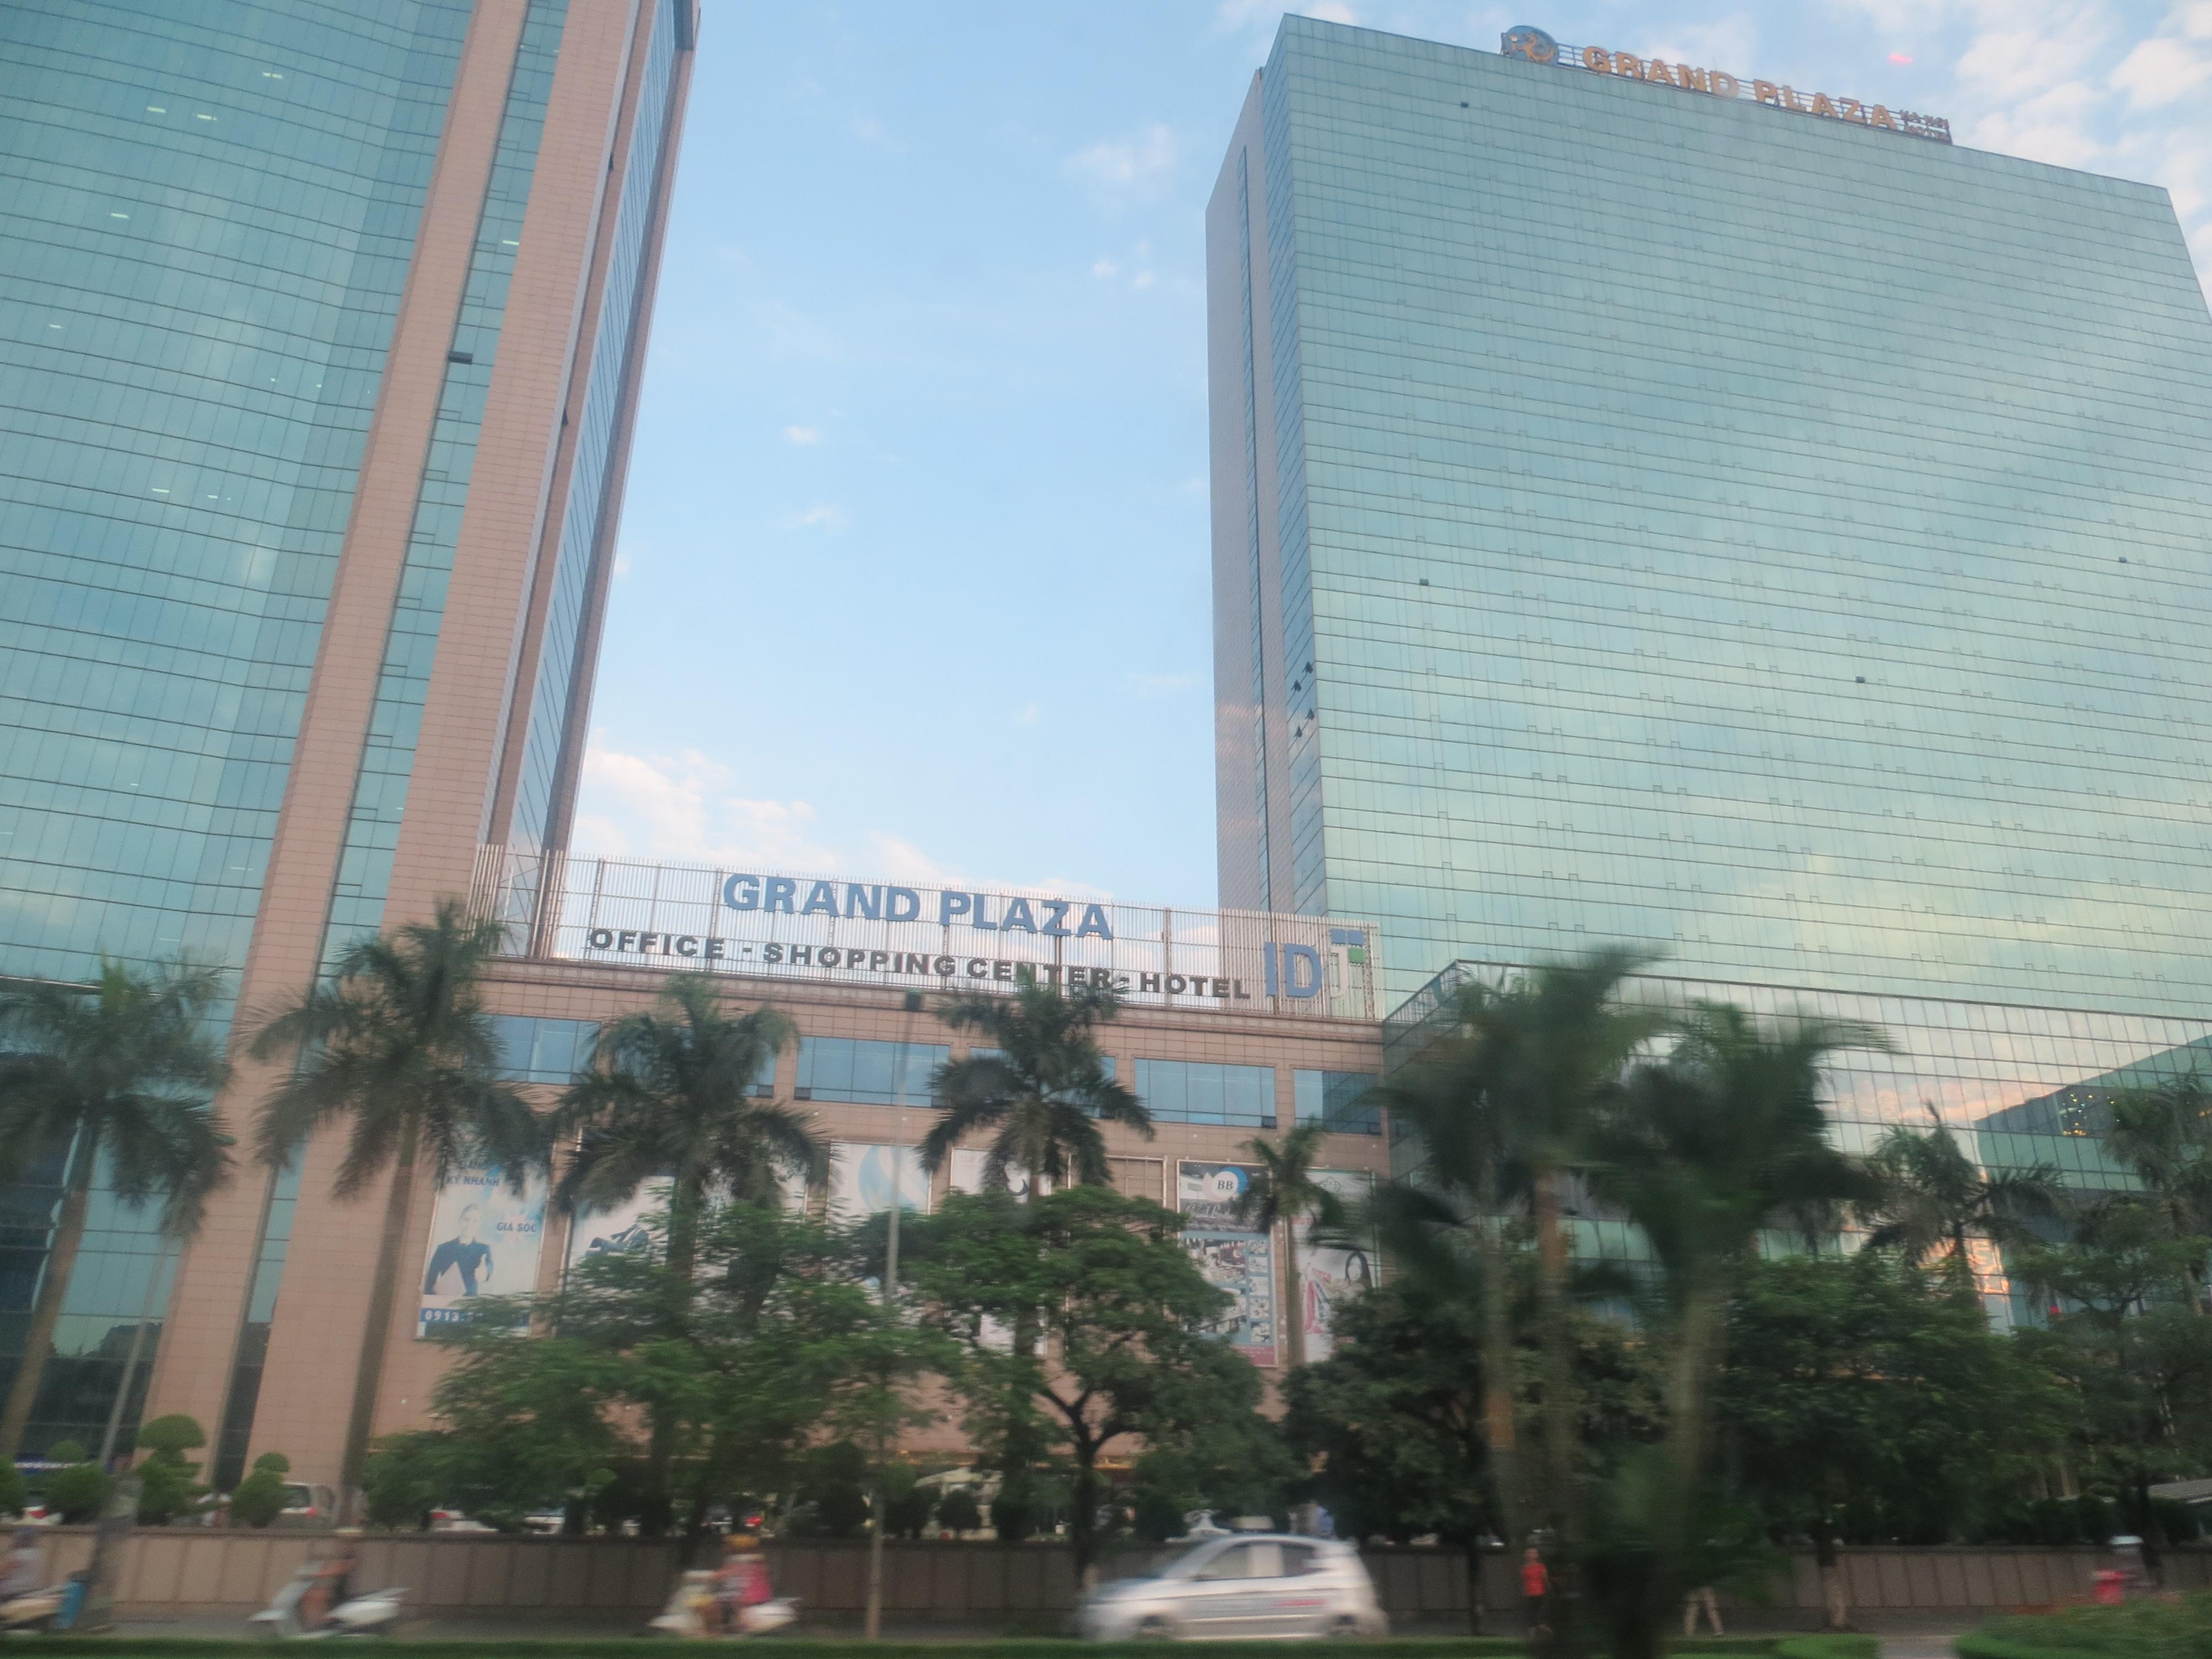 Grand Plaza Hotel St Pete Beach Florida